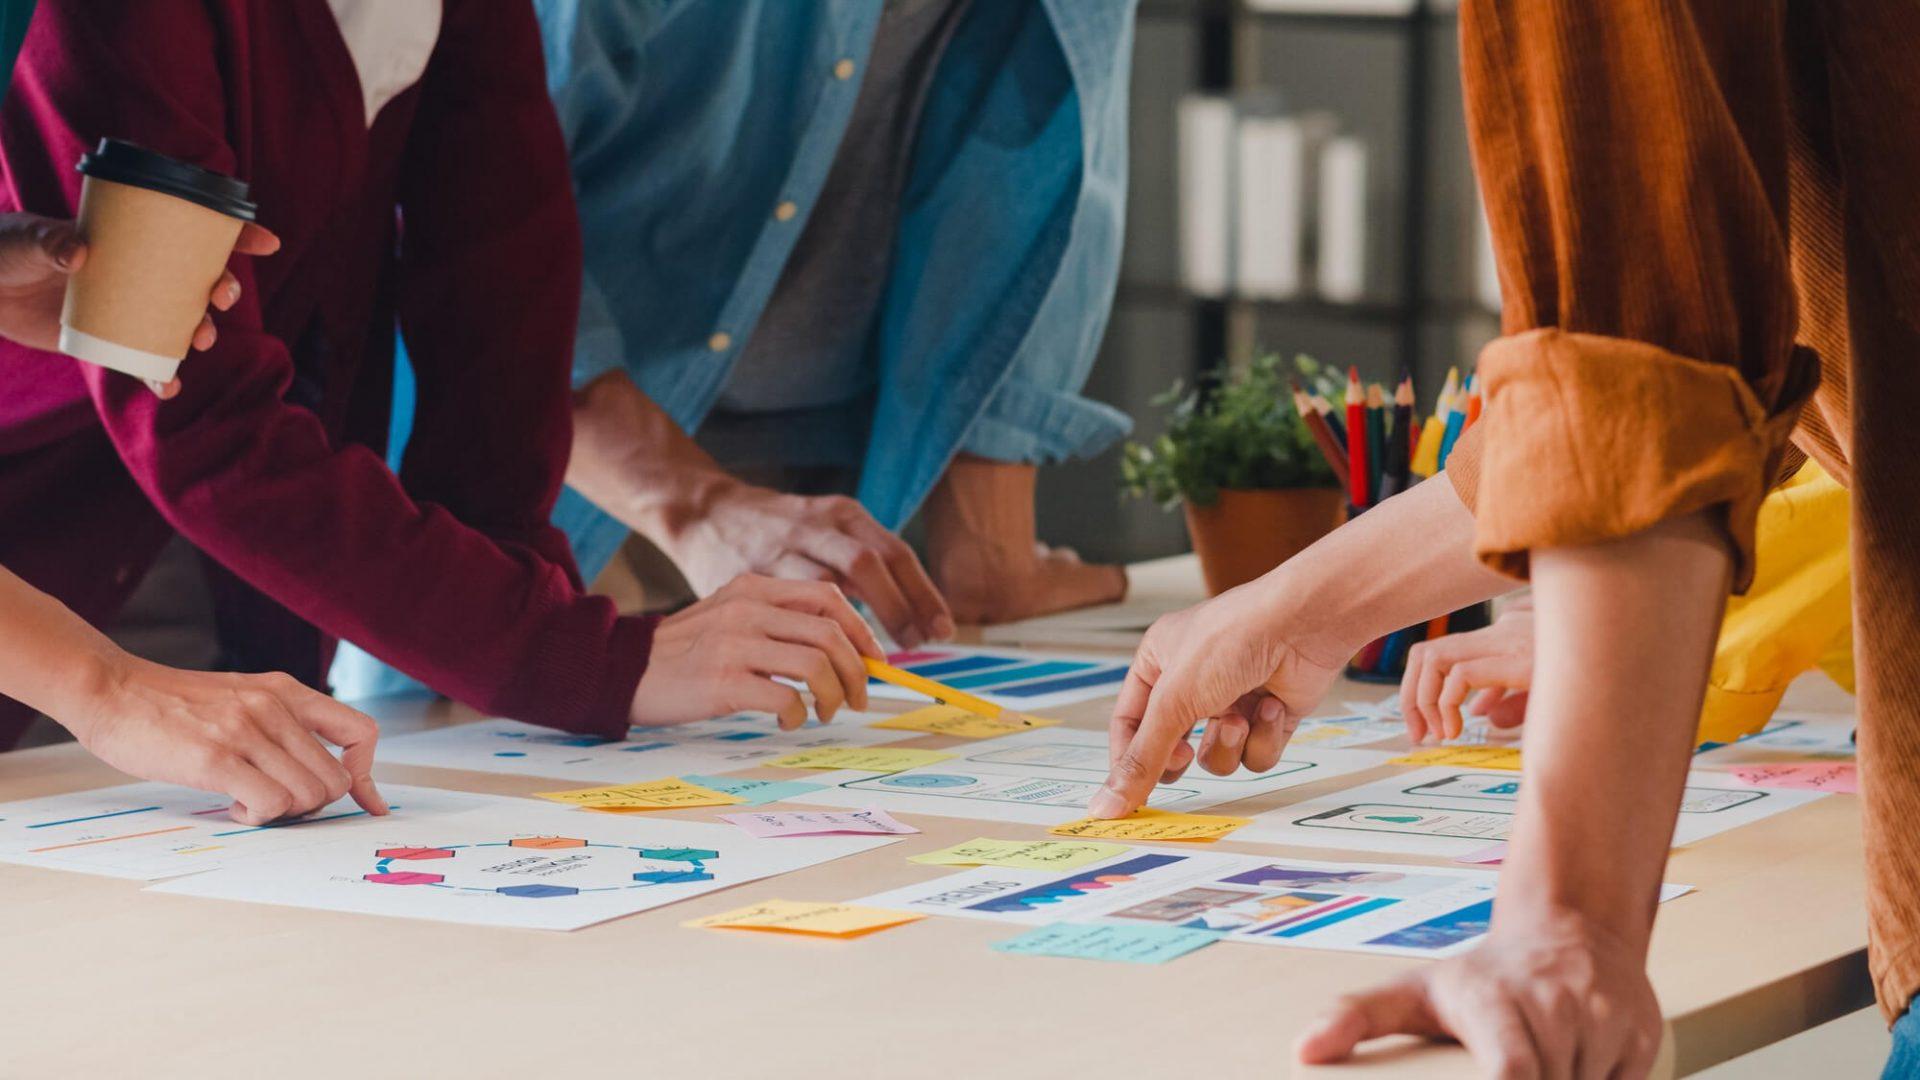 Asian businessmen meeting brainstorming ideas about creative web design